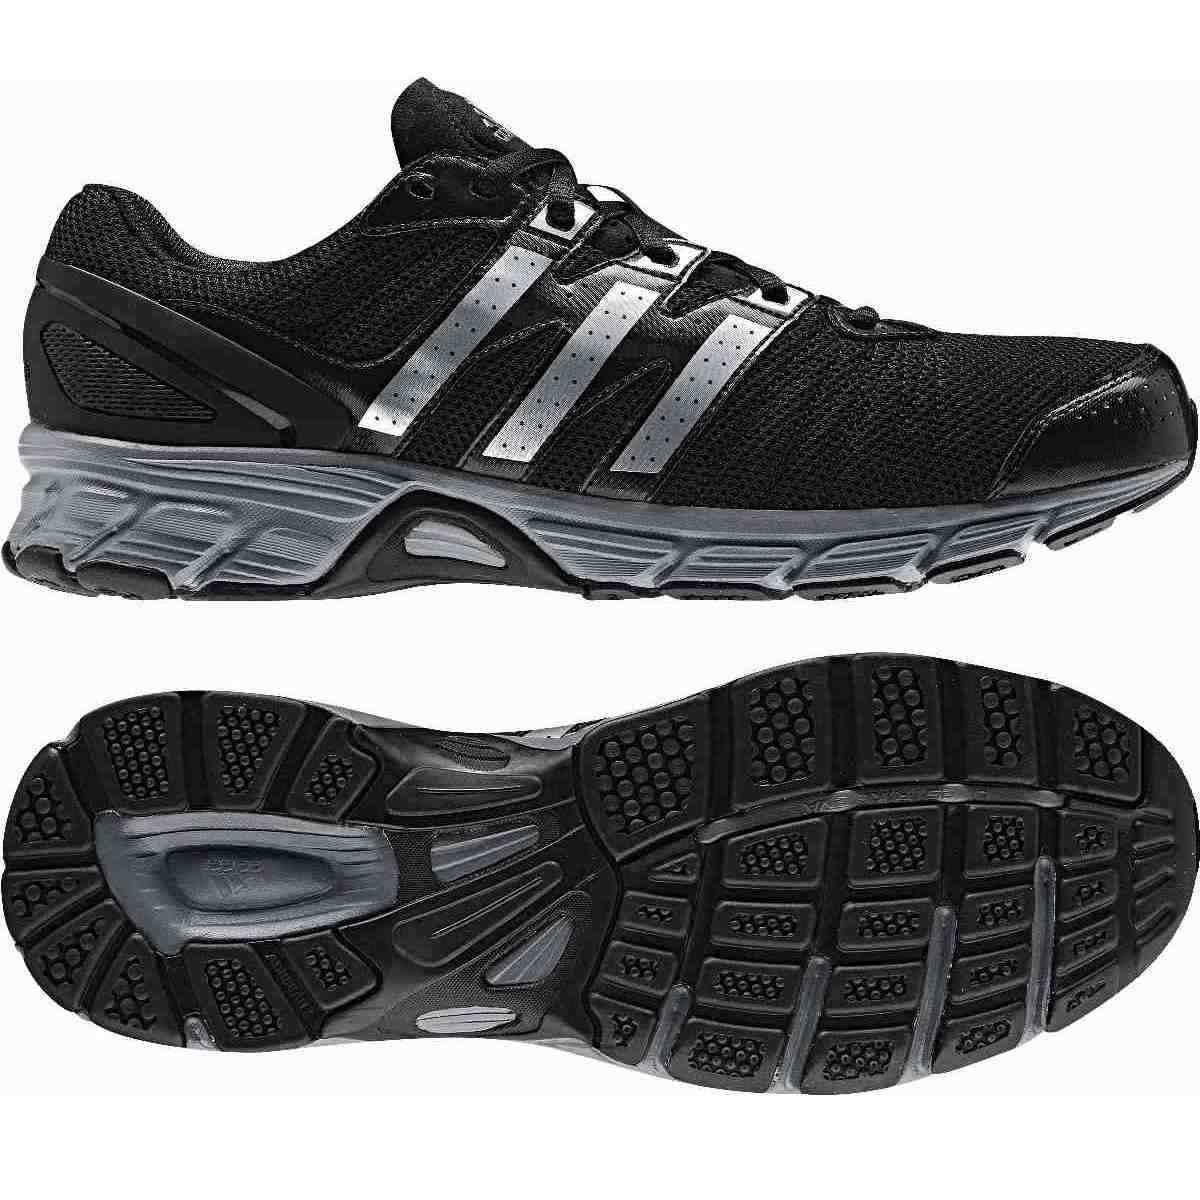 adidas roadmace m laufschuhe joggingschuhe sportschuhe herren diverse farben ebay. Black Bedroom Furniture Sets. Home Design Ideas